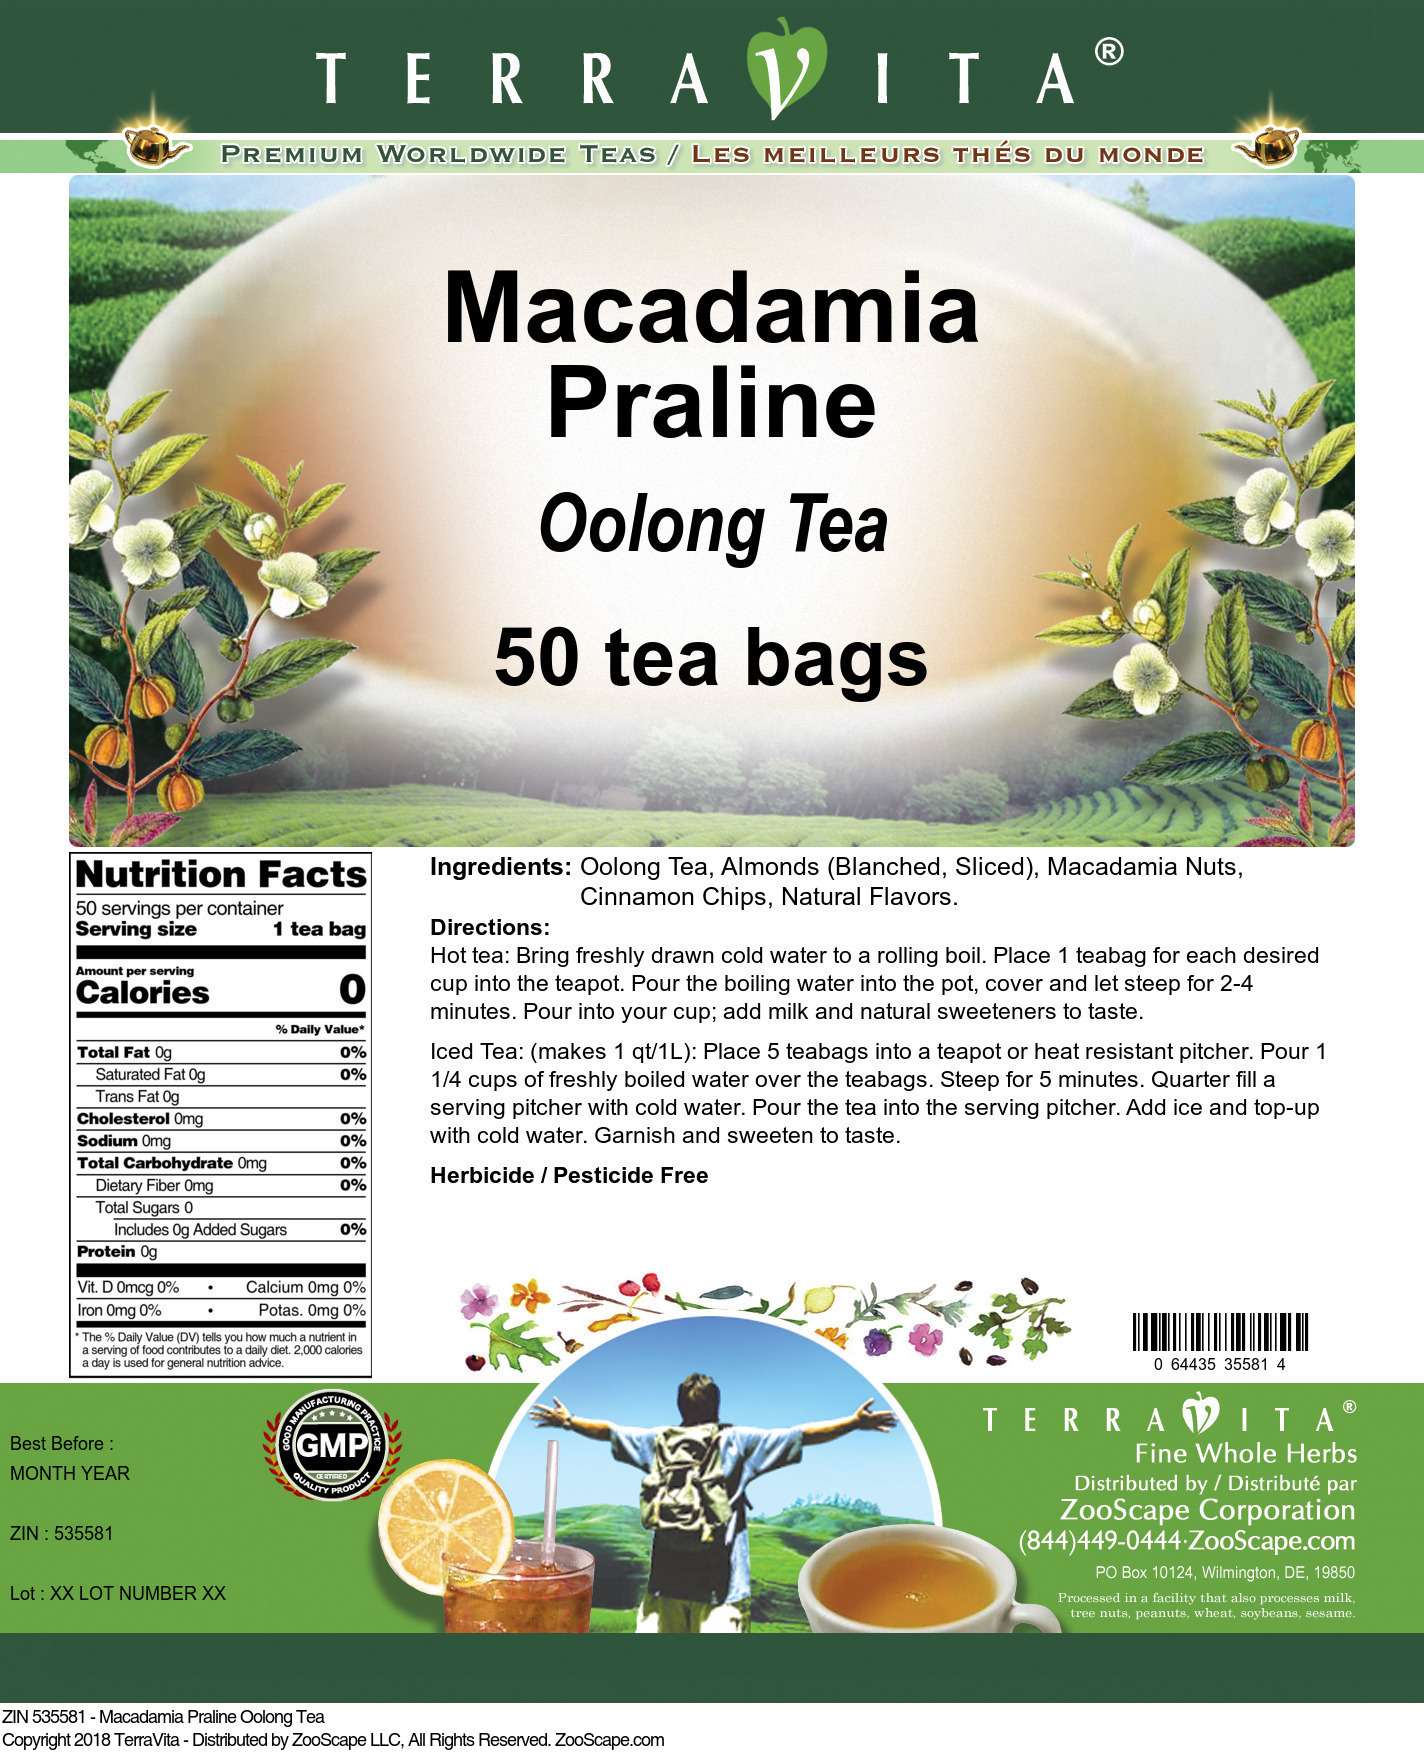 Macadamia Praline Oolong Tea